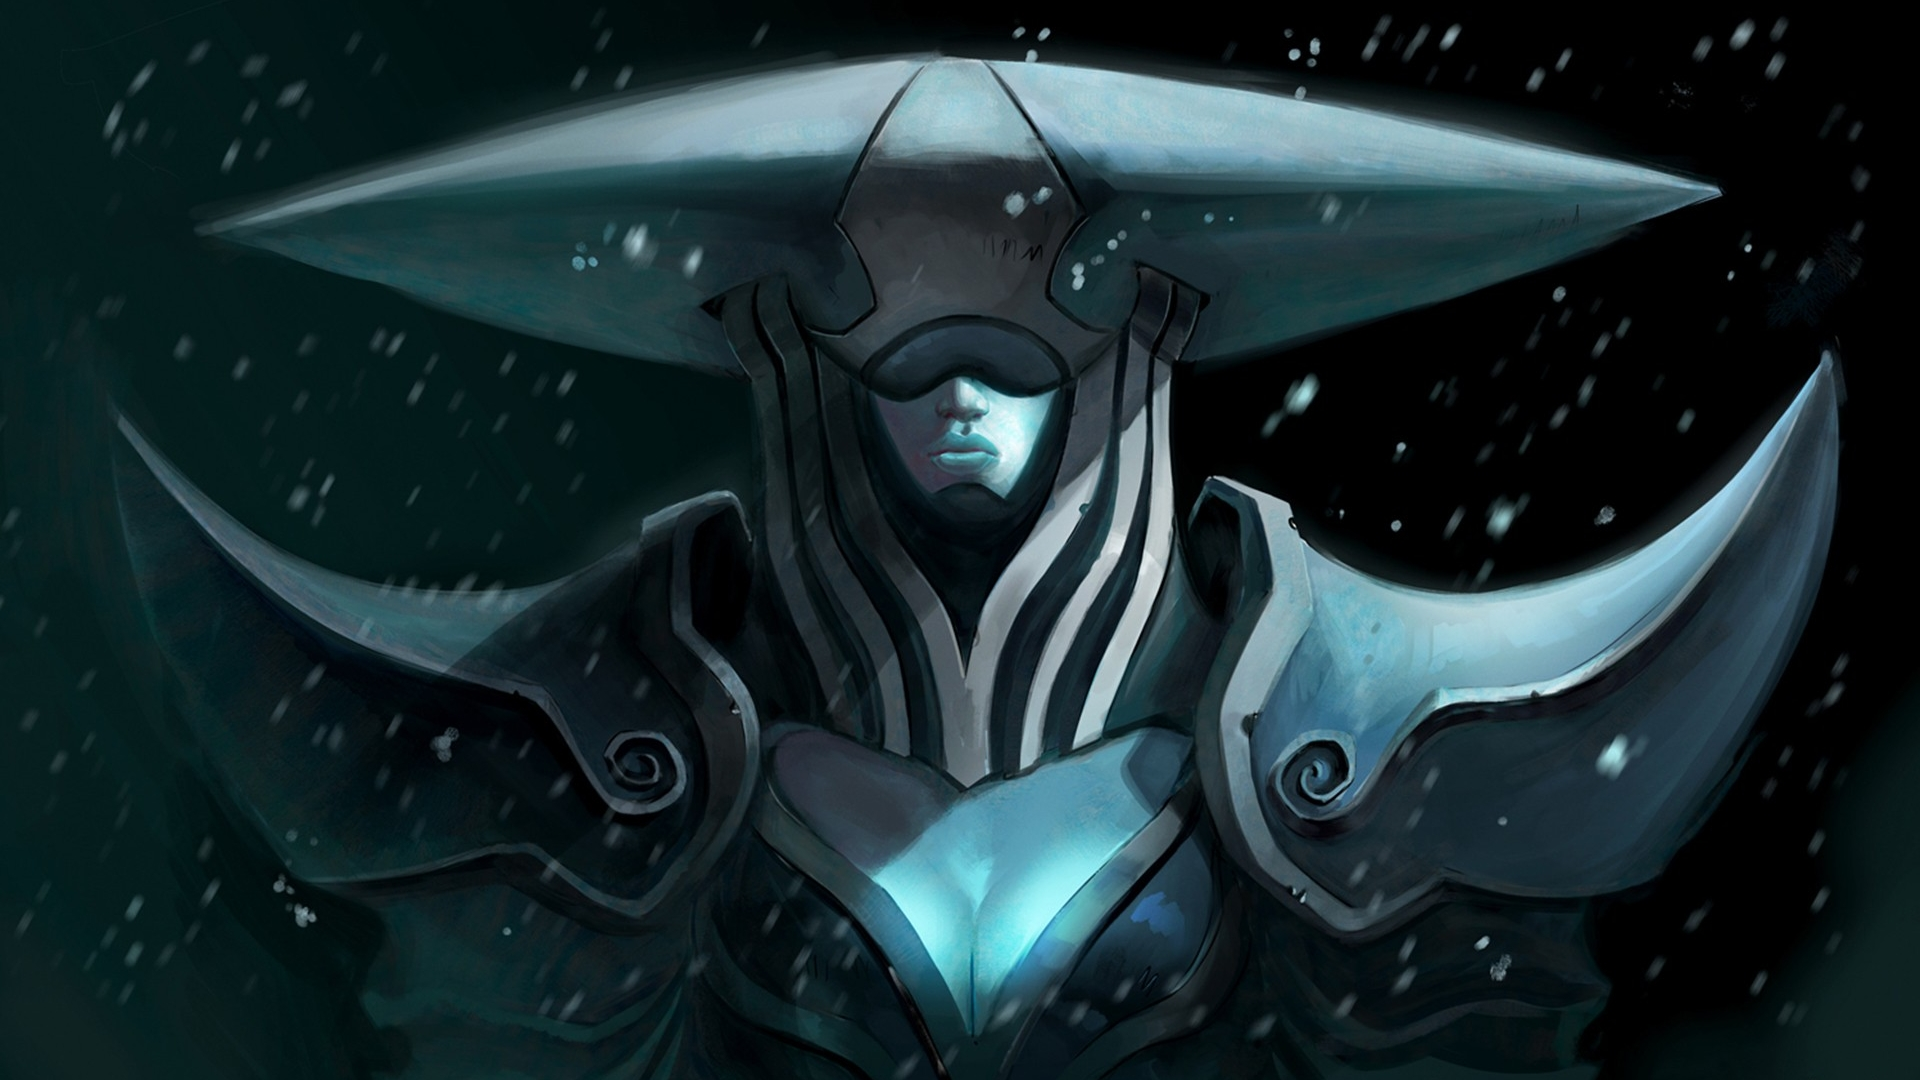 Alpha Coders Wallpaper Abyss Video Game League Of Legends 520462